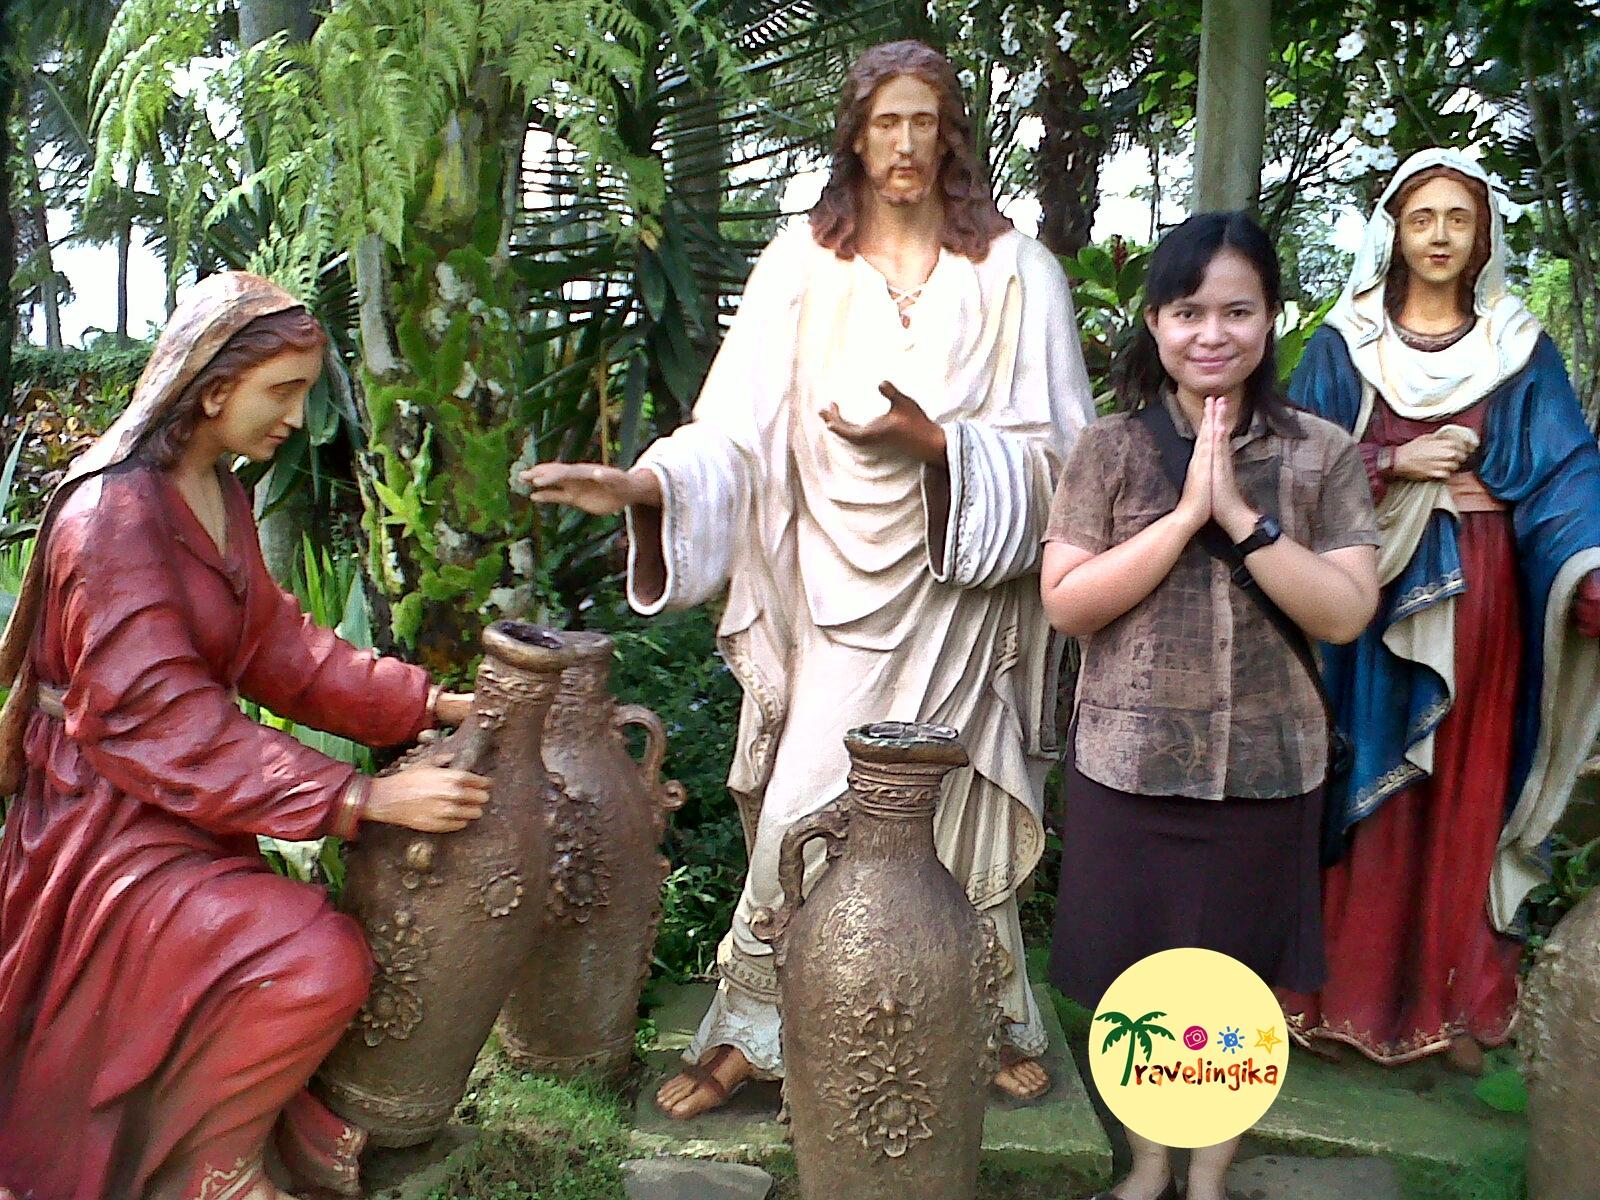 Gua Maria Kerep Wisata Religi Ambarawa Travelingika Rohani Lokasi Sejuk